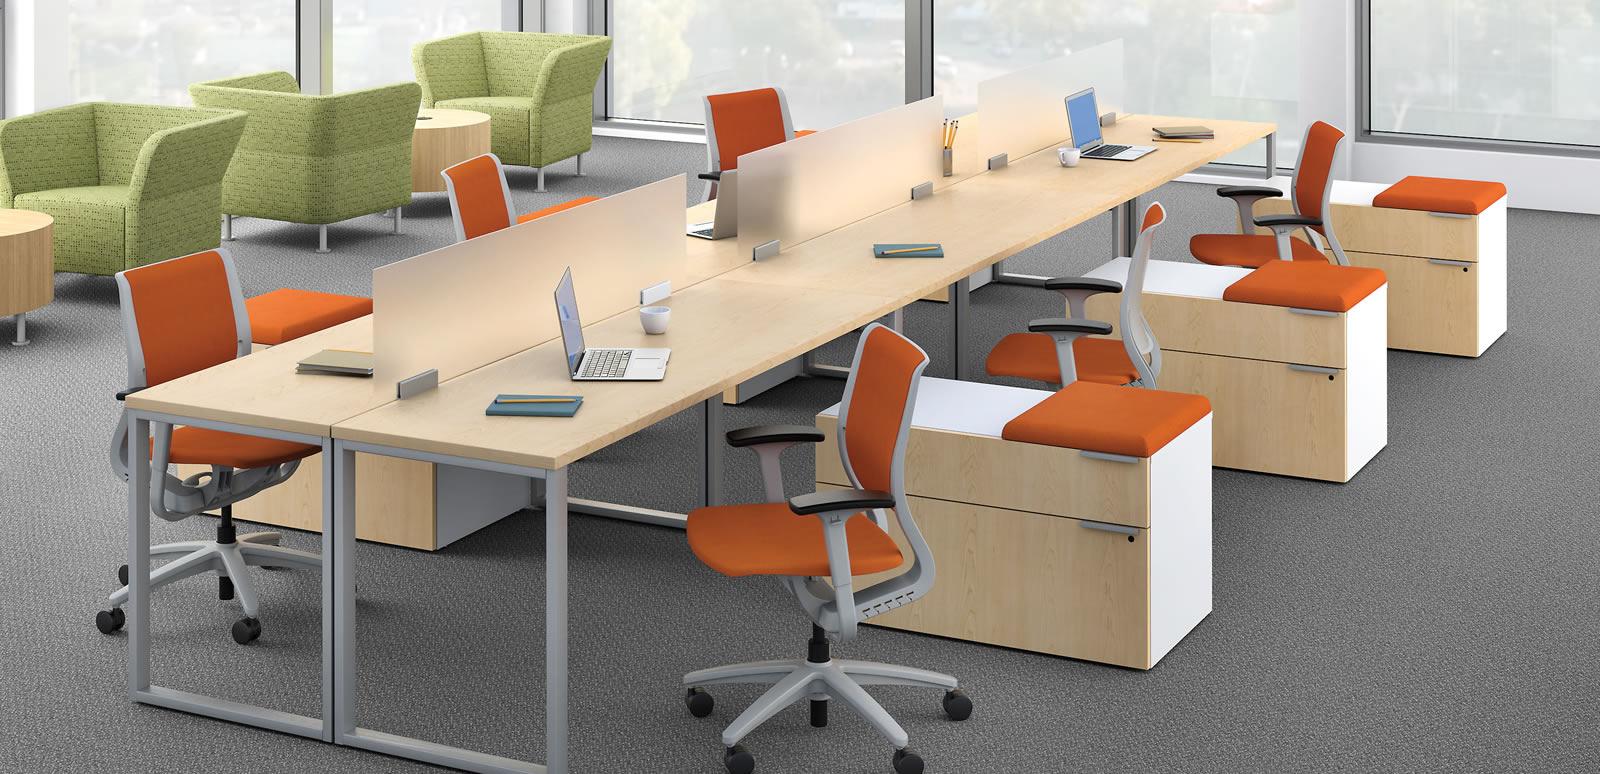 office furniture stackstreet AQFDWEO